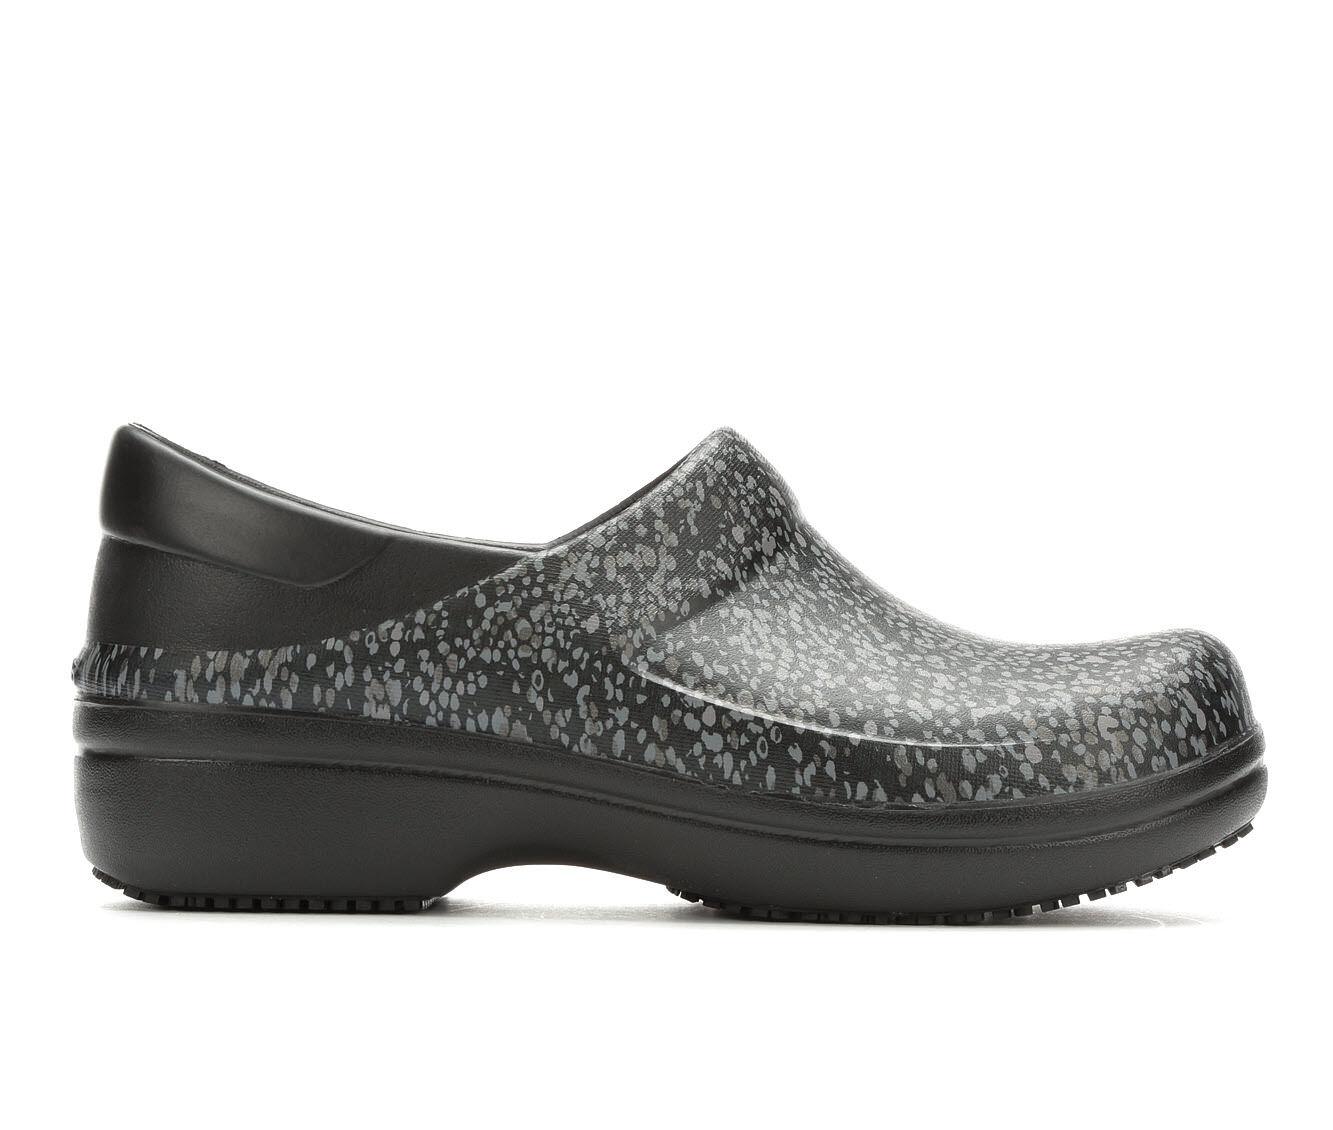 Women's Crocs Work Neria Pro II Graphic Slip-Resistant Clogs Black/Dots